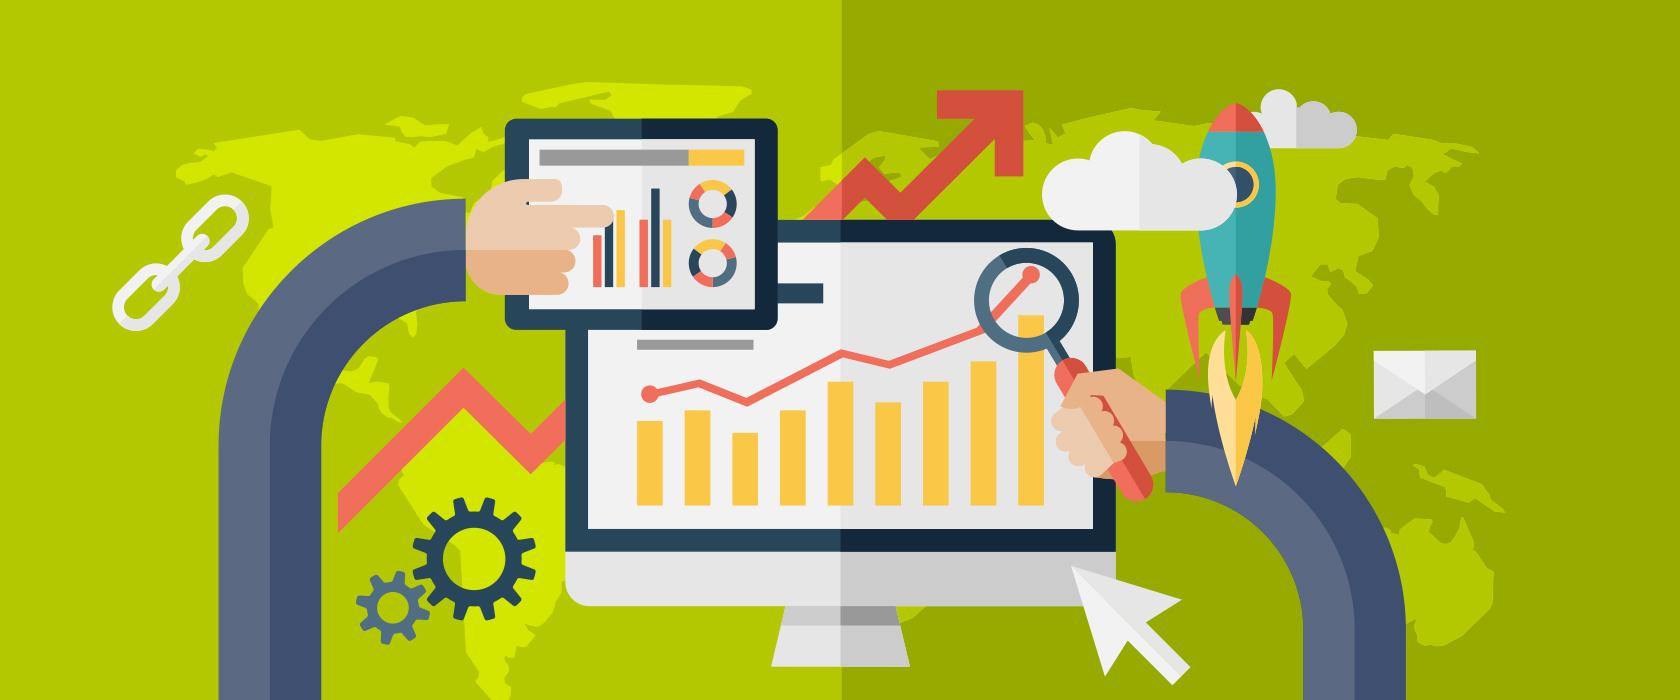 Search Engine Marketing Improve Your SEO Rank